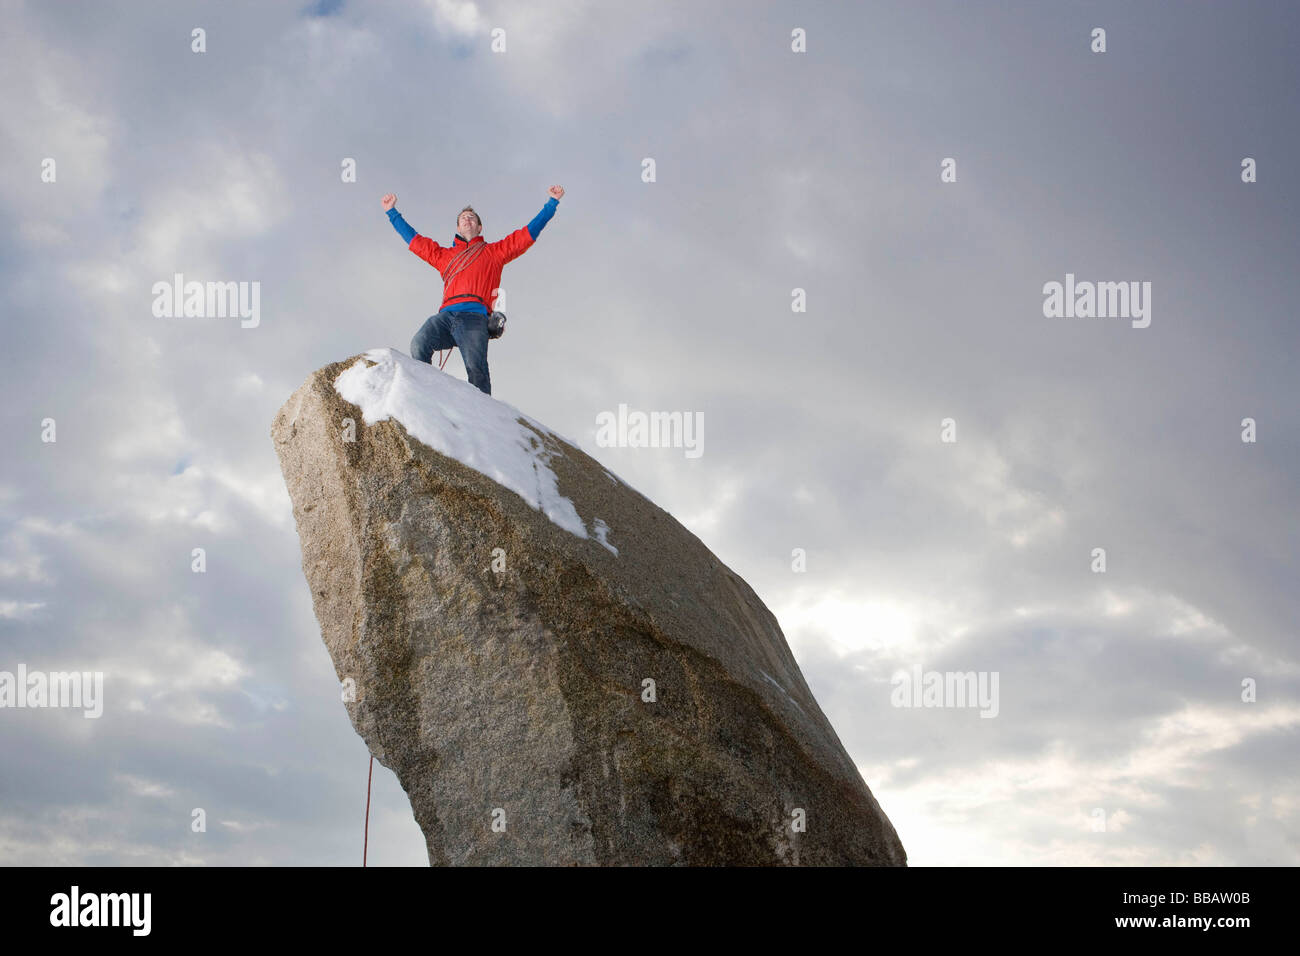 Scalatore celebrando in Snow capped peak Immagini Stock